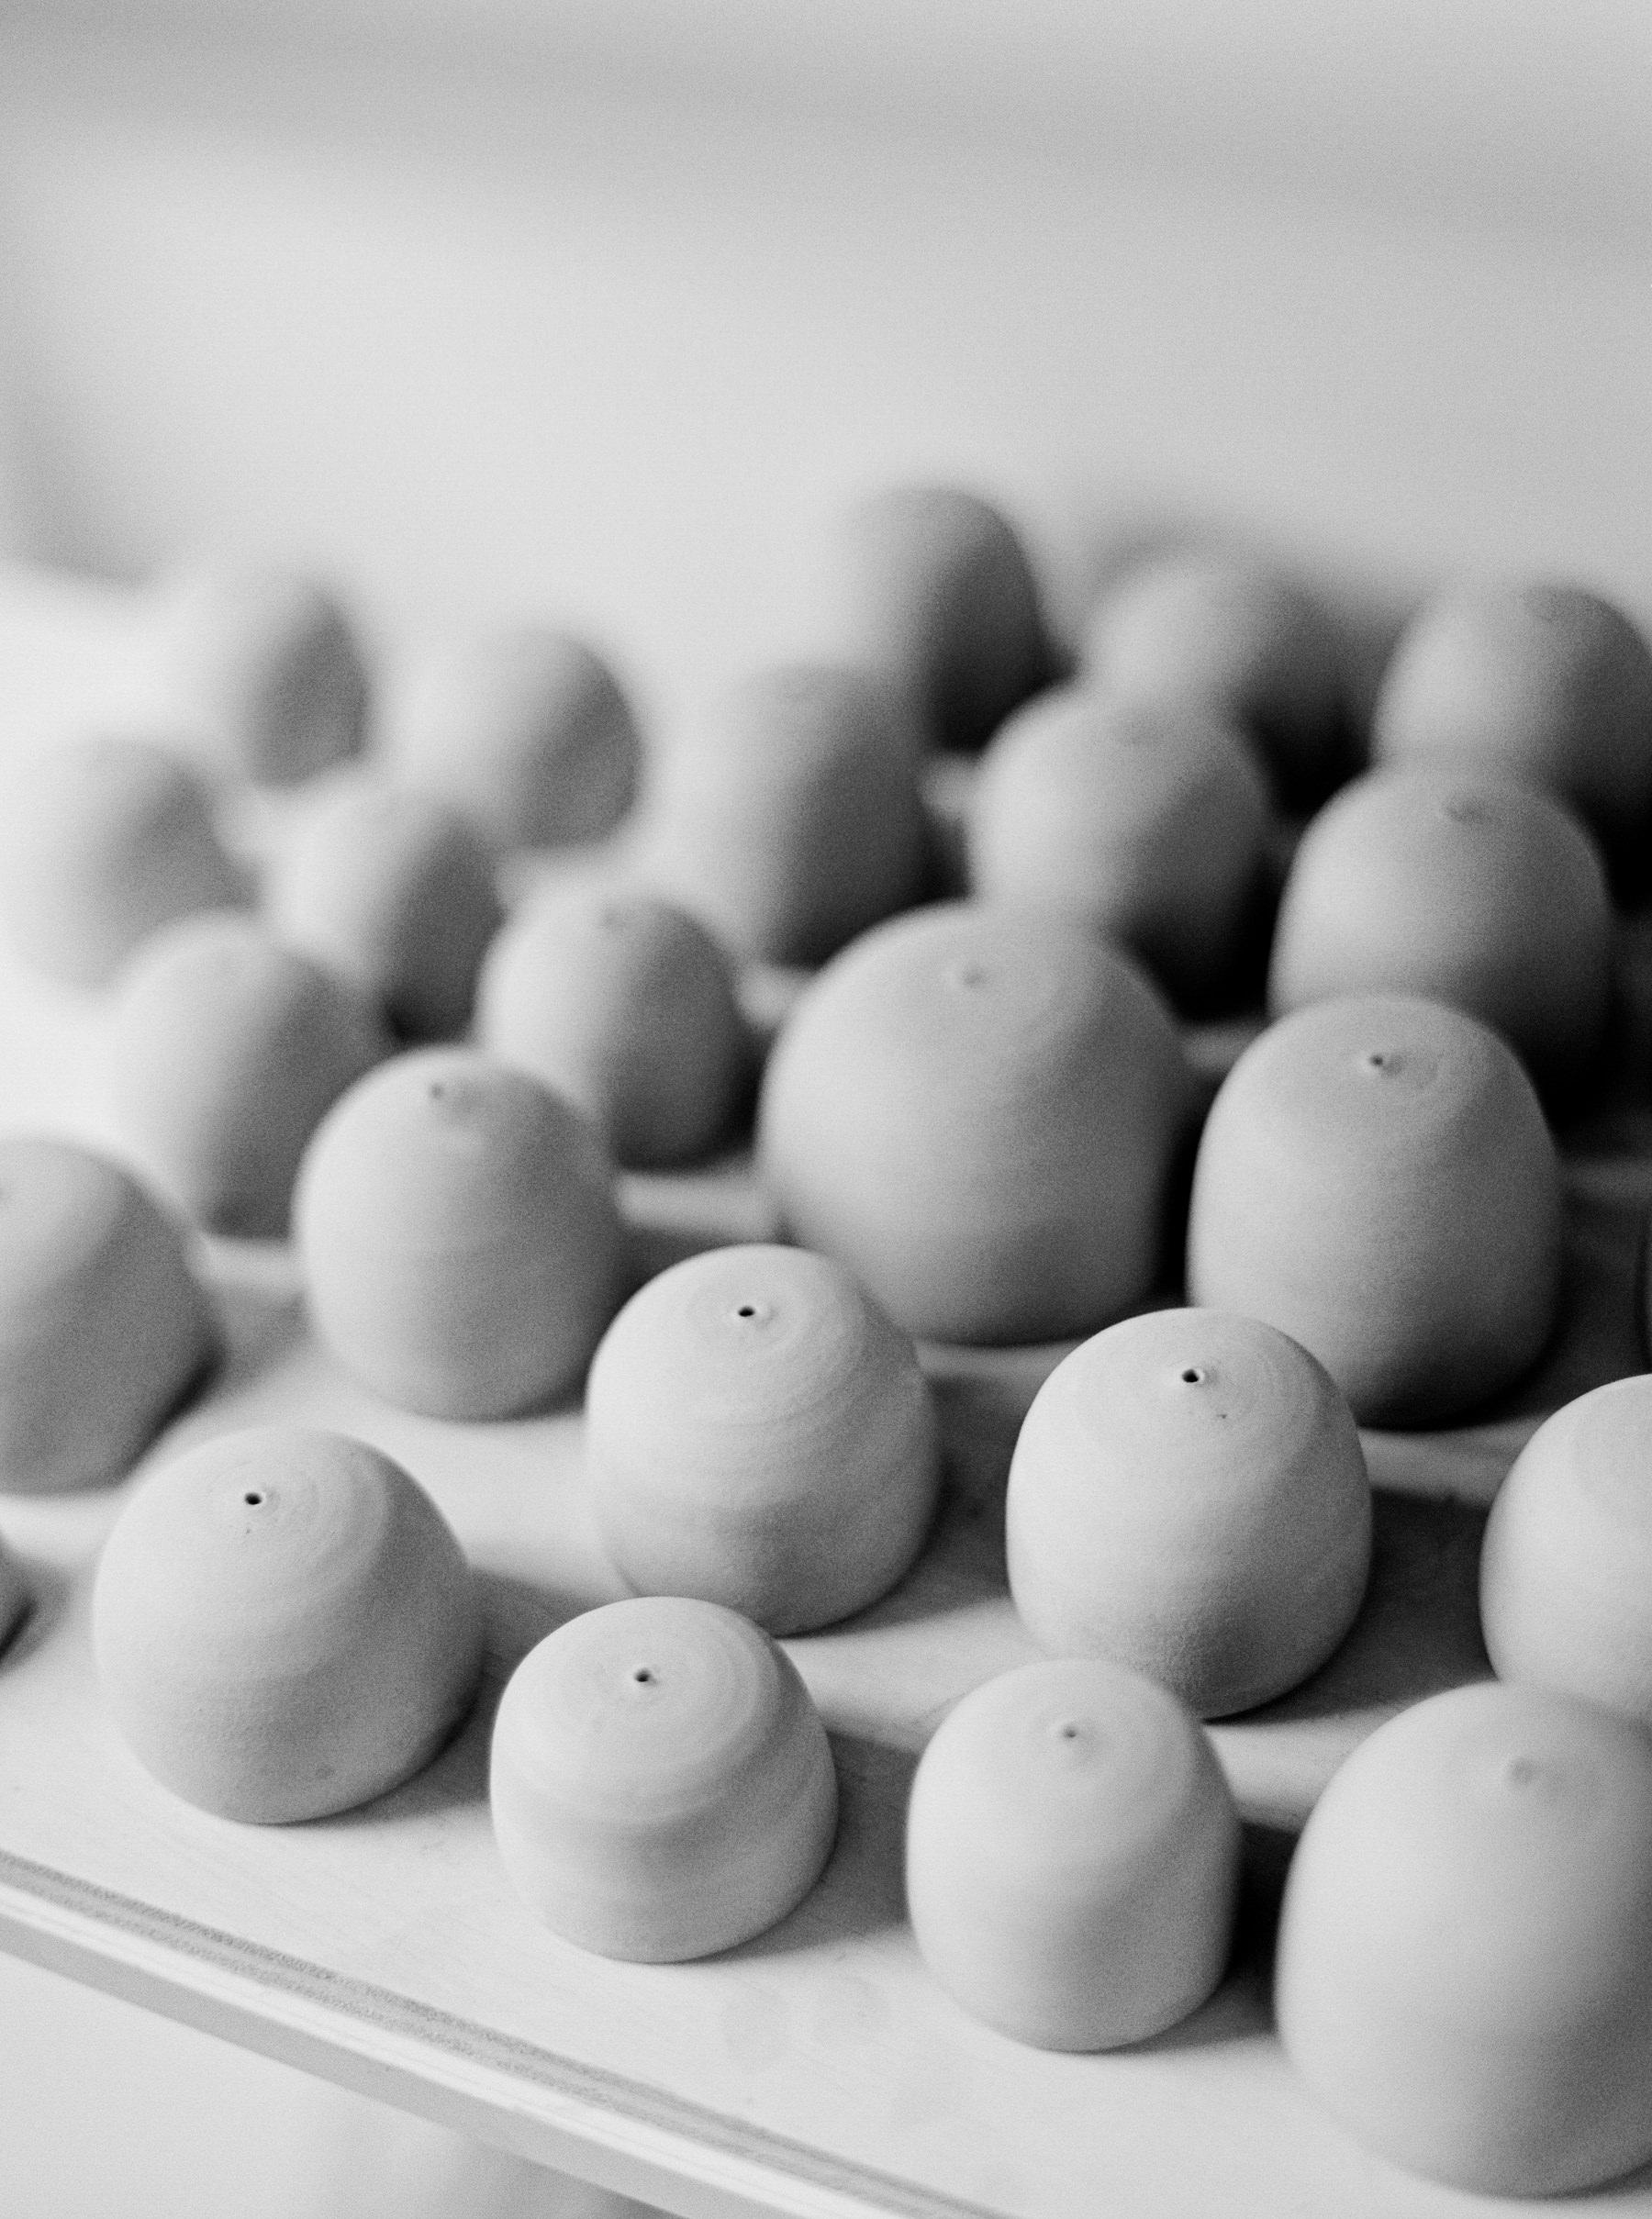 artistprofile-katherinemoes-pottery-annapeters-annapetersphoto-unearthing.tc-11.jpg